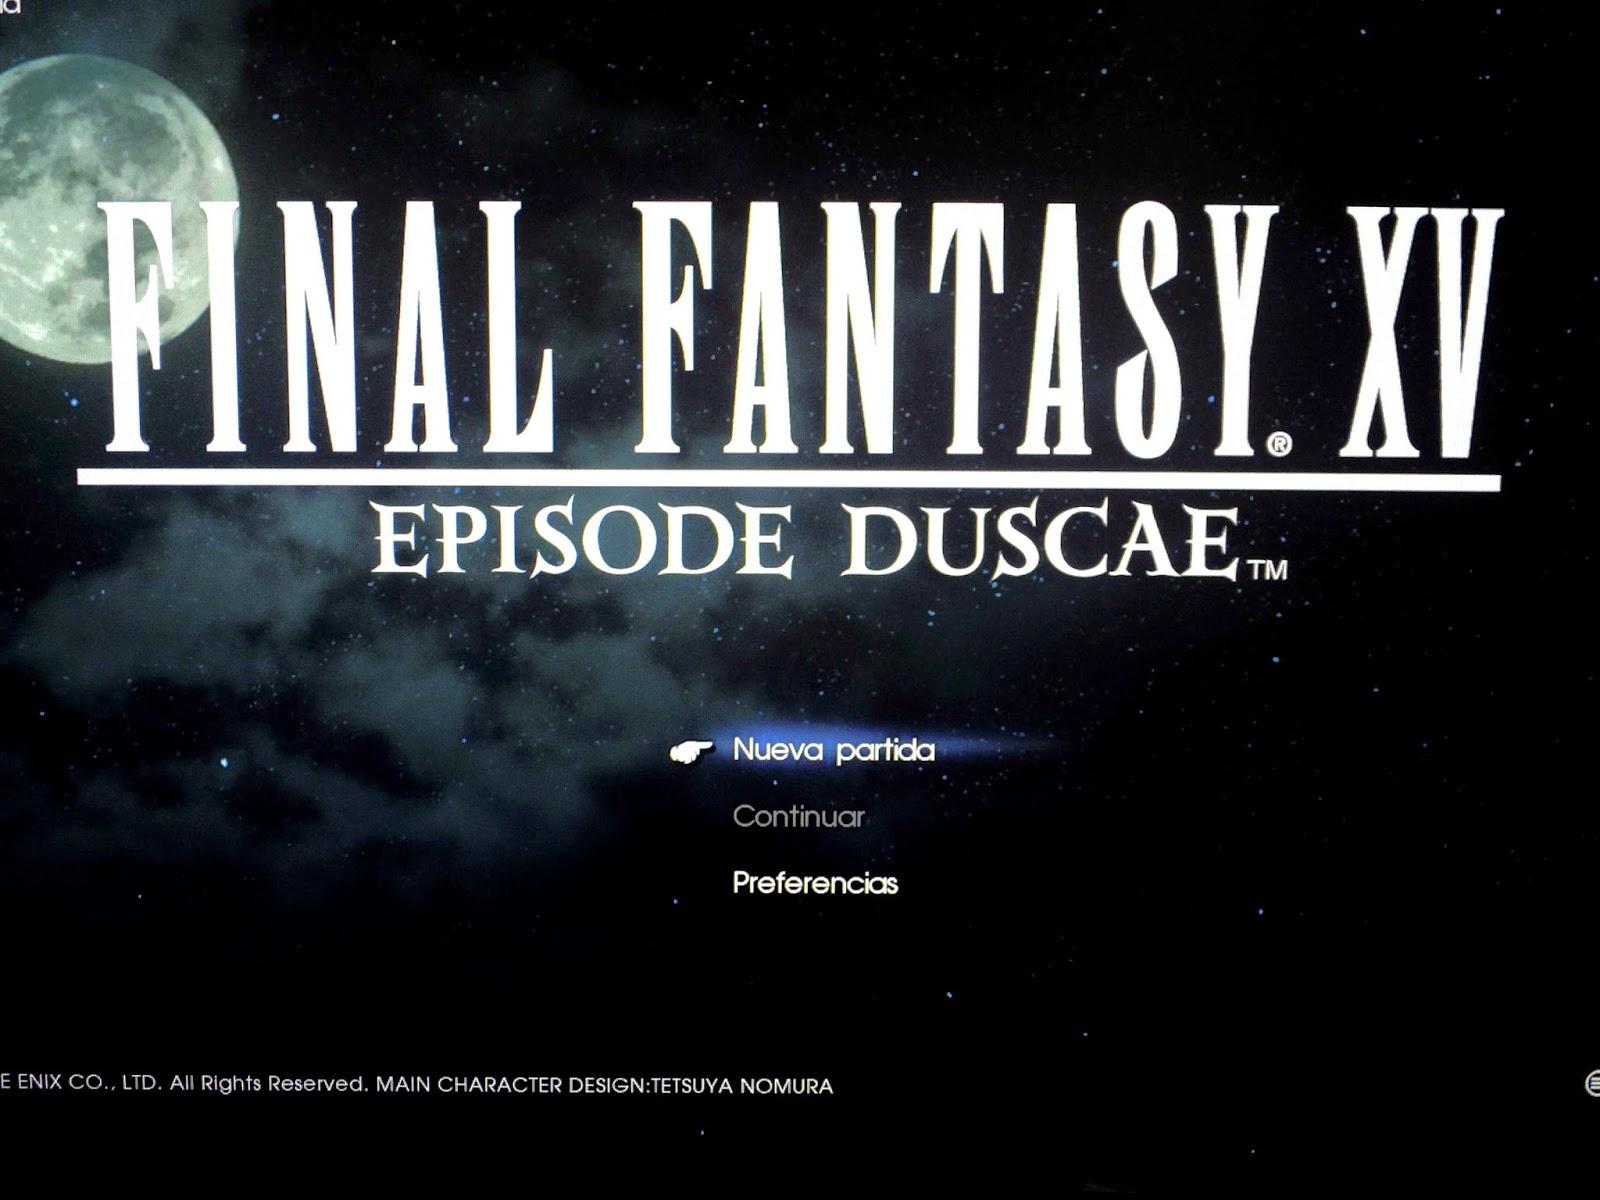 demo final fantasy xv episode duscae codigo